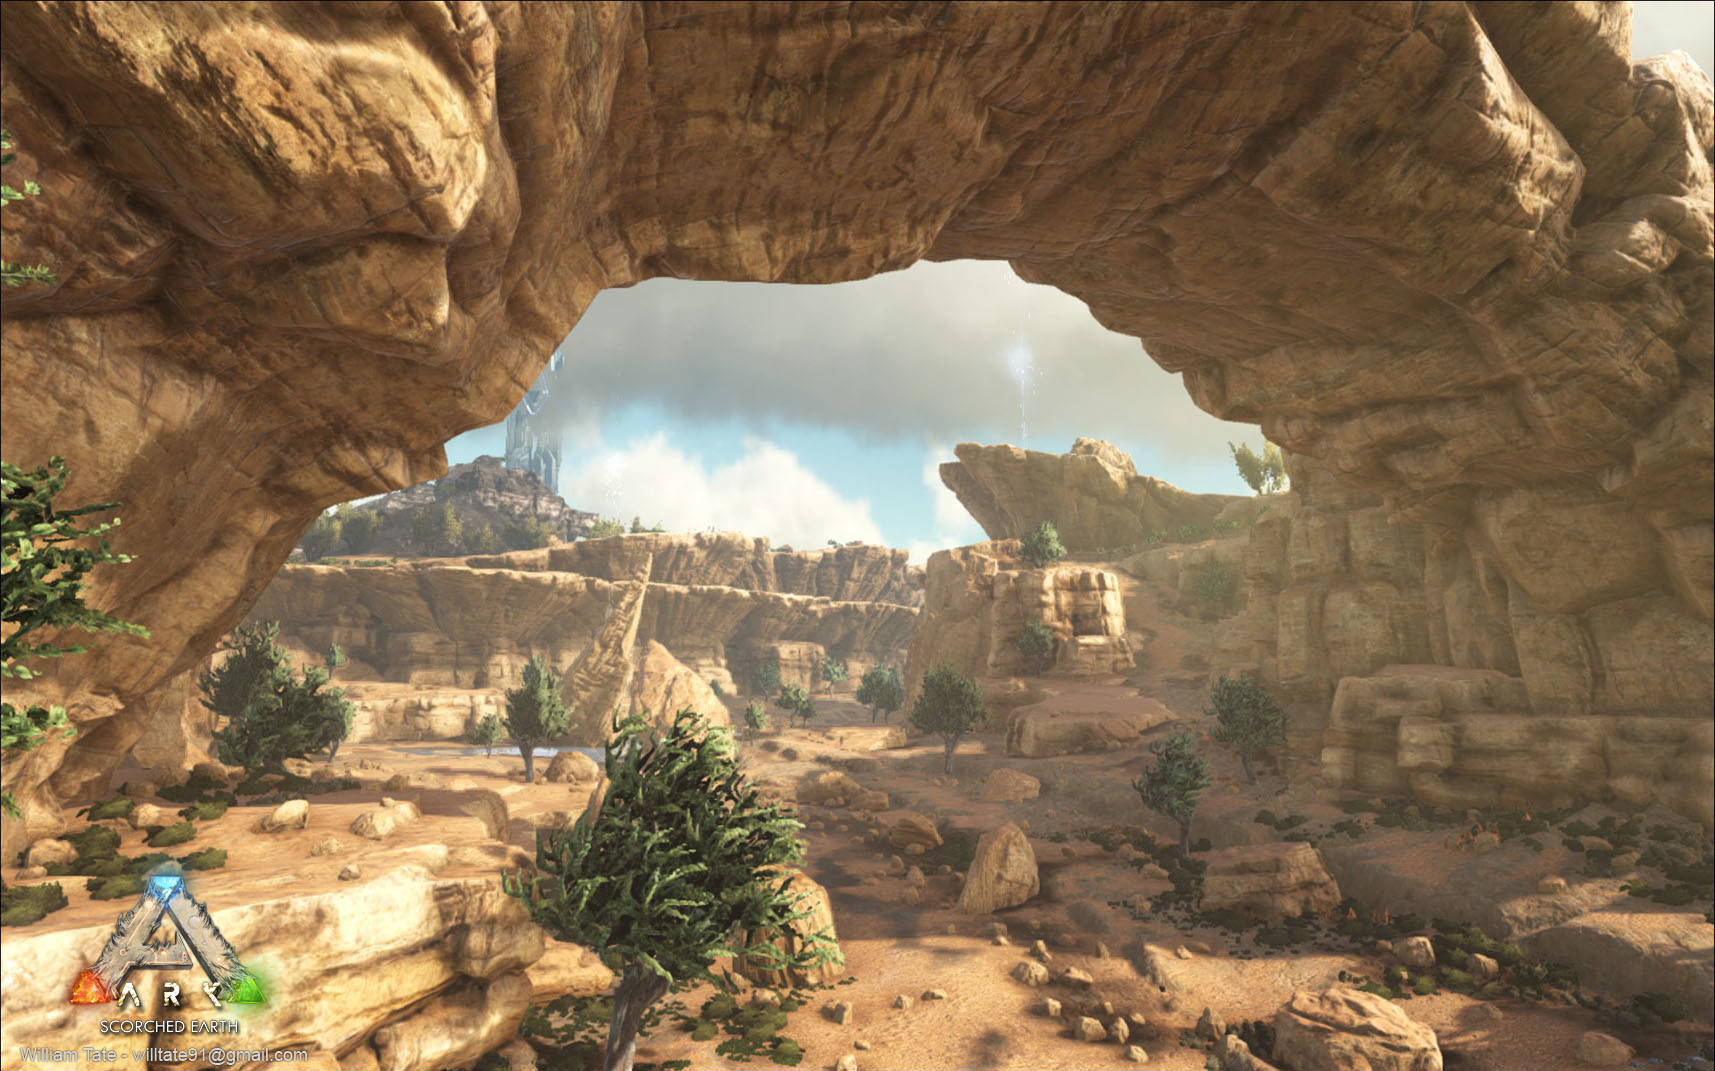 ArtStation - Ark: Scorched Earth DLC - Vistas, William Tate